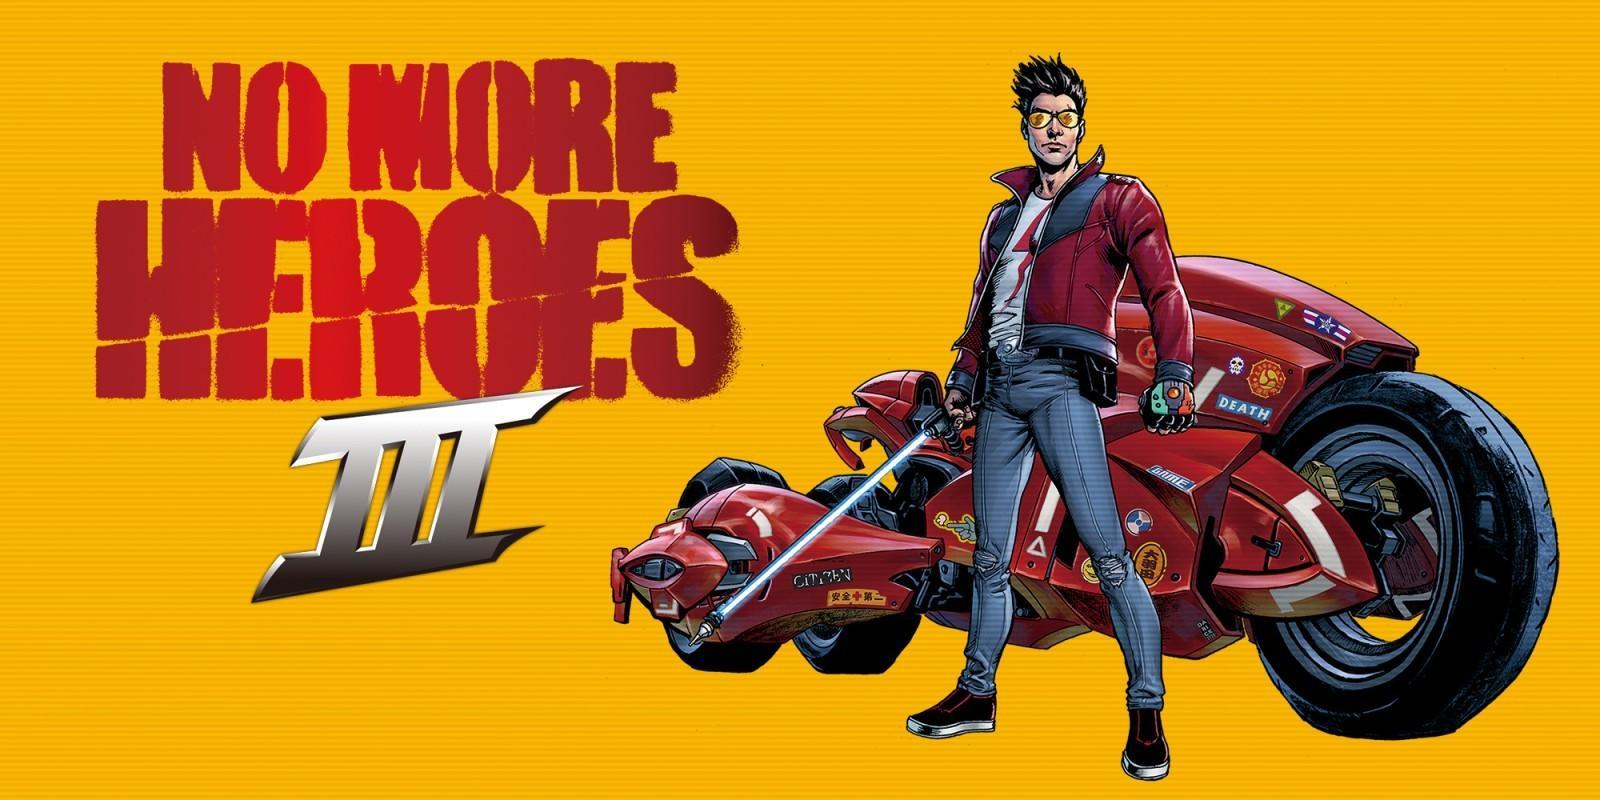 Marvelous анонсировали стрим по No More Heroes 3, трансляция пройдёт 8 апреля 3